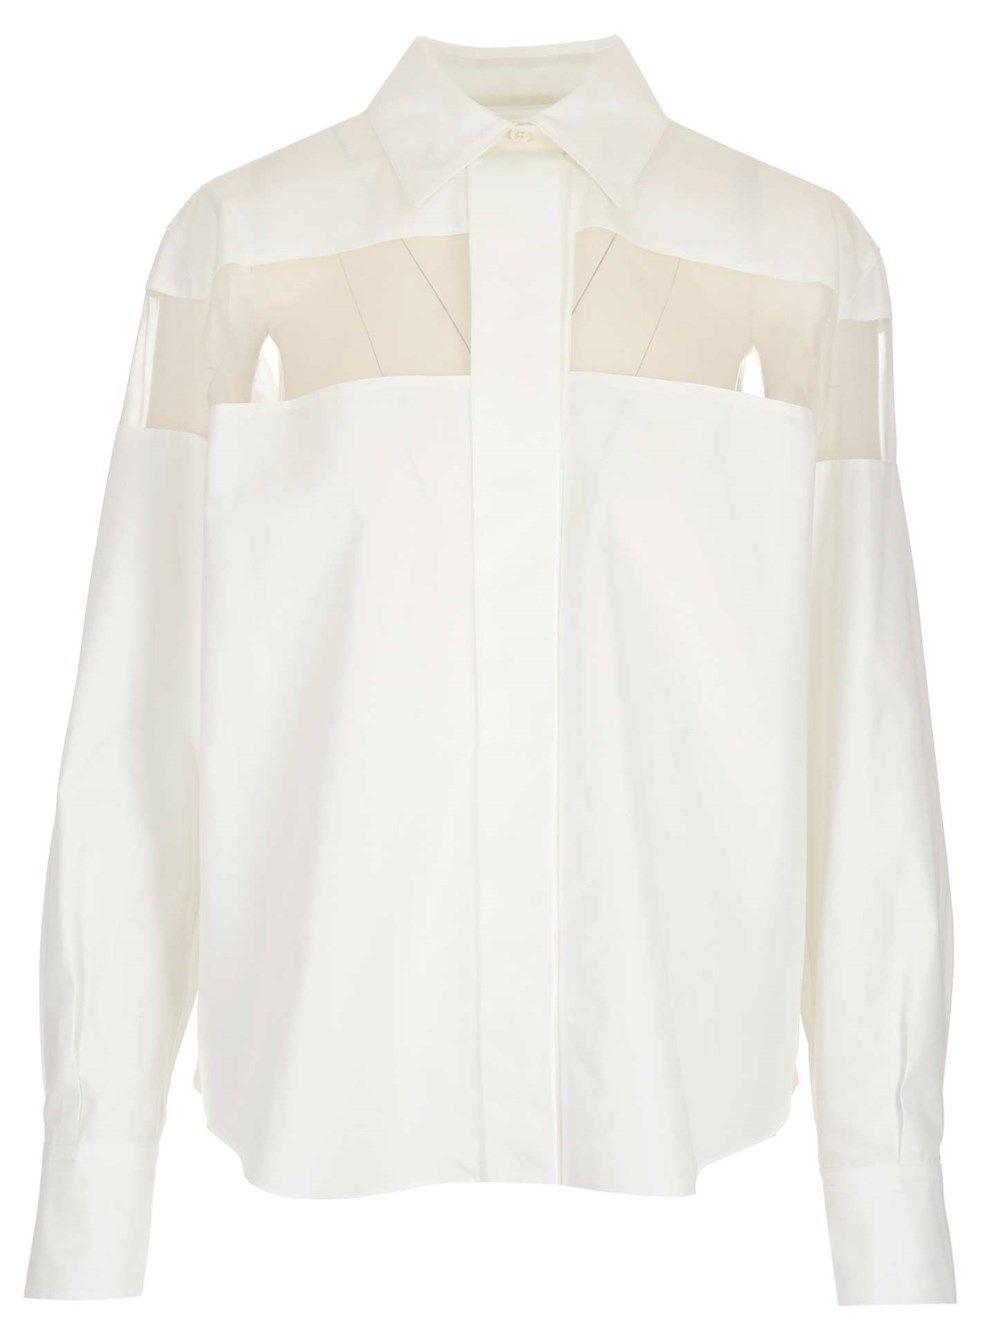 Valentino VALENTINO WOMEN'S WHITE OTHER MATERIALS SHIRT